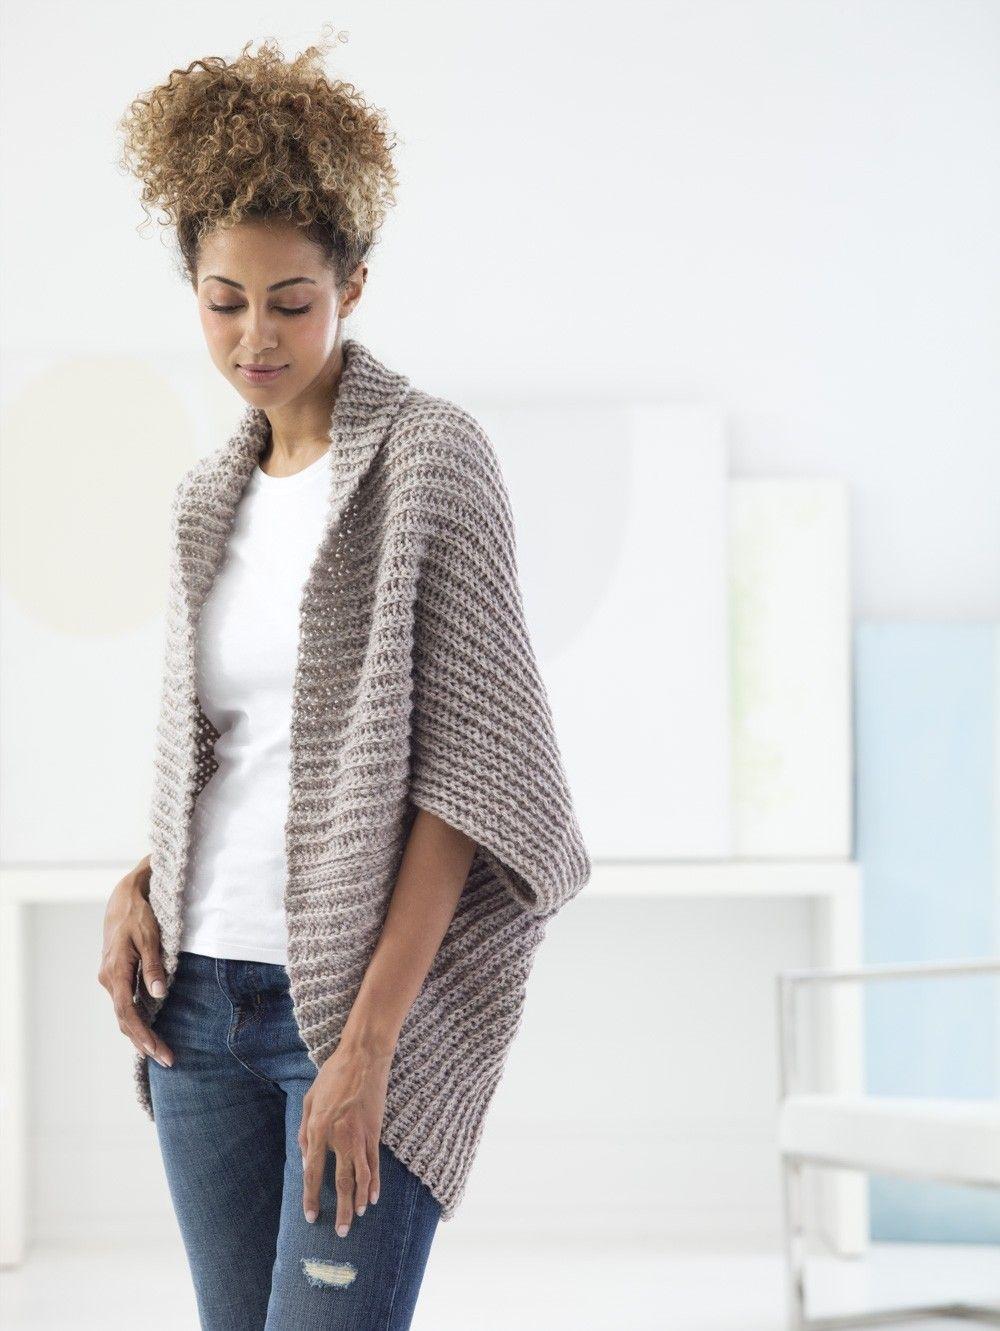 Touch of Alpaca: Now in Bonus Bundles! + 4 Free Patterns | Crochet ...